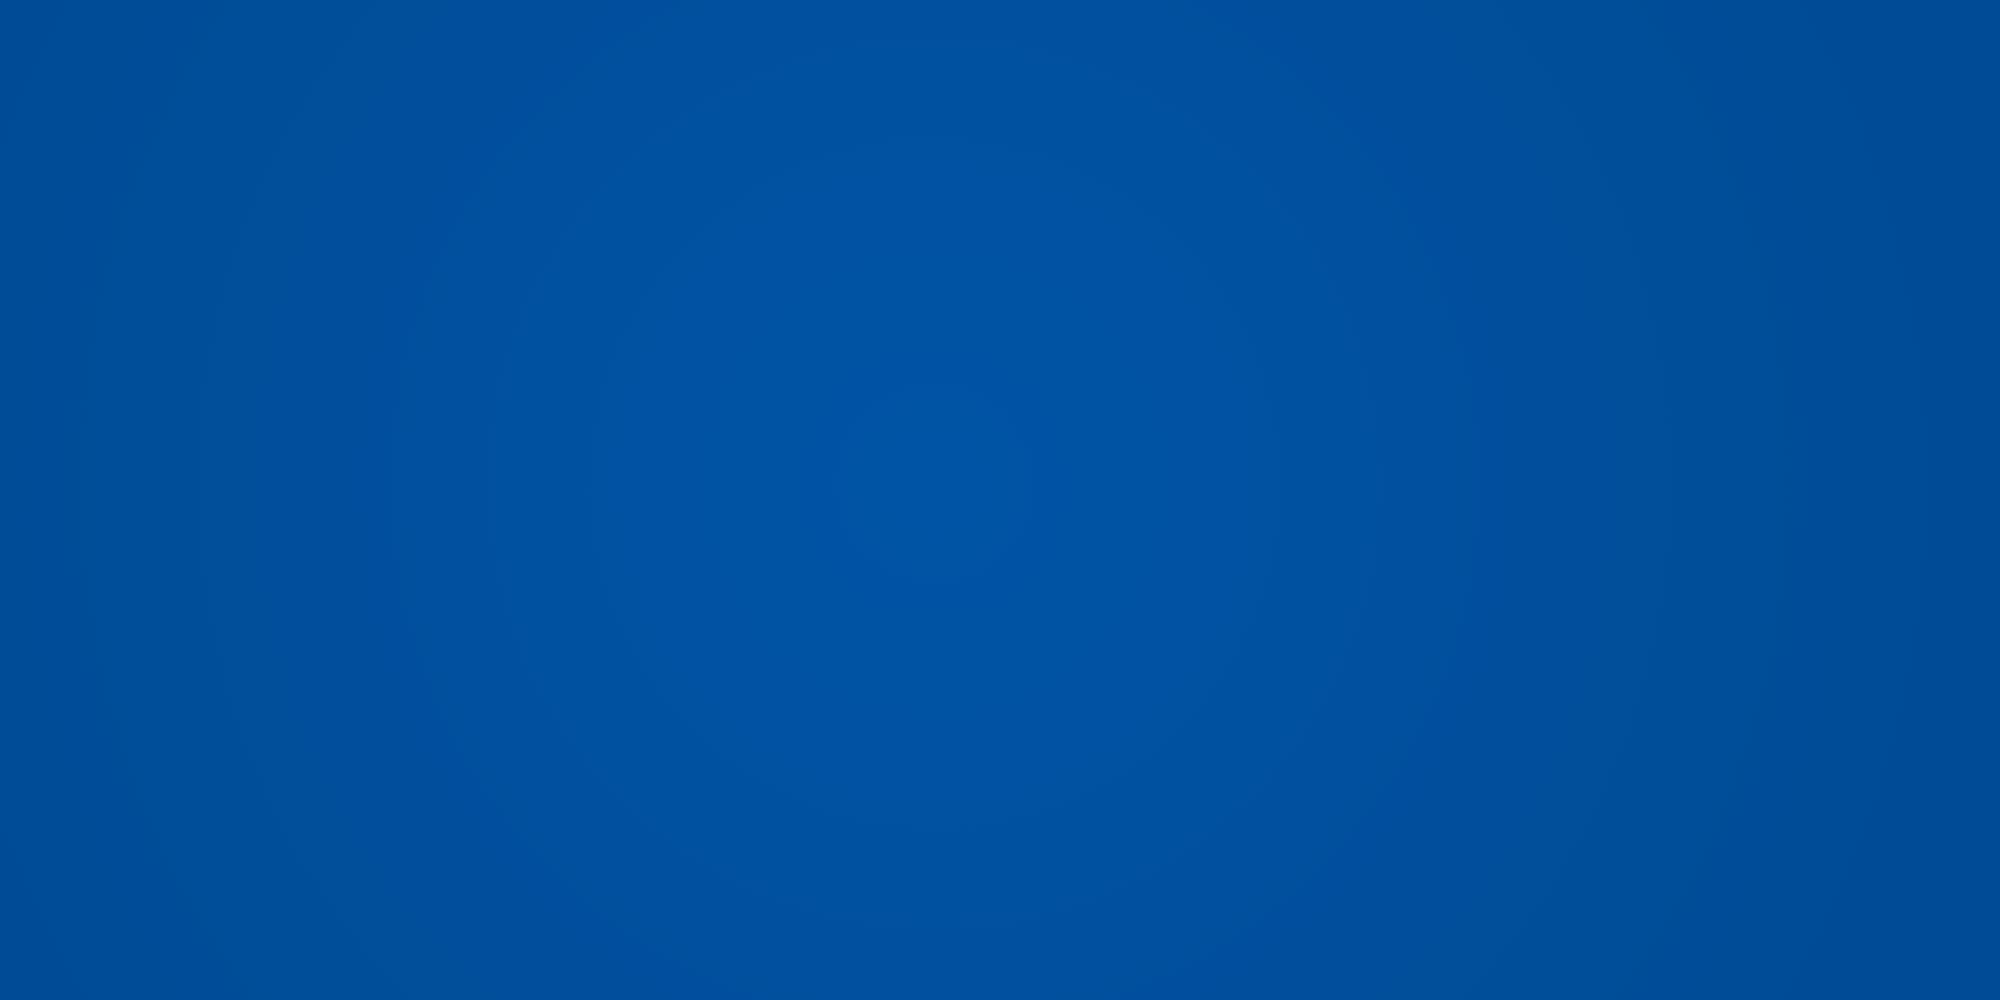 lavazza-blue-ozadje